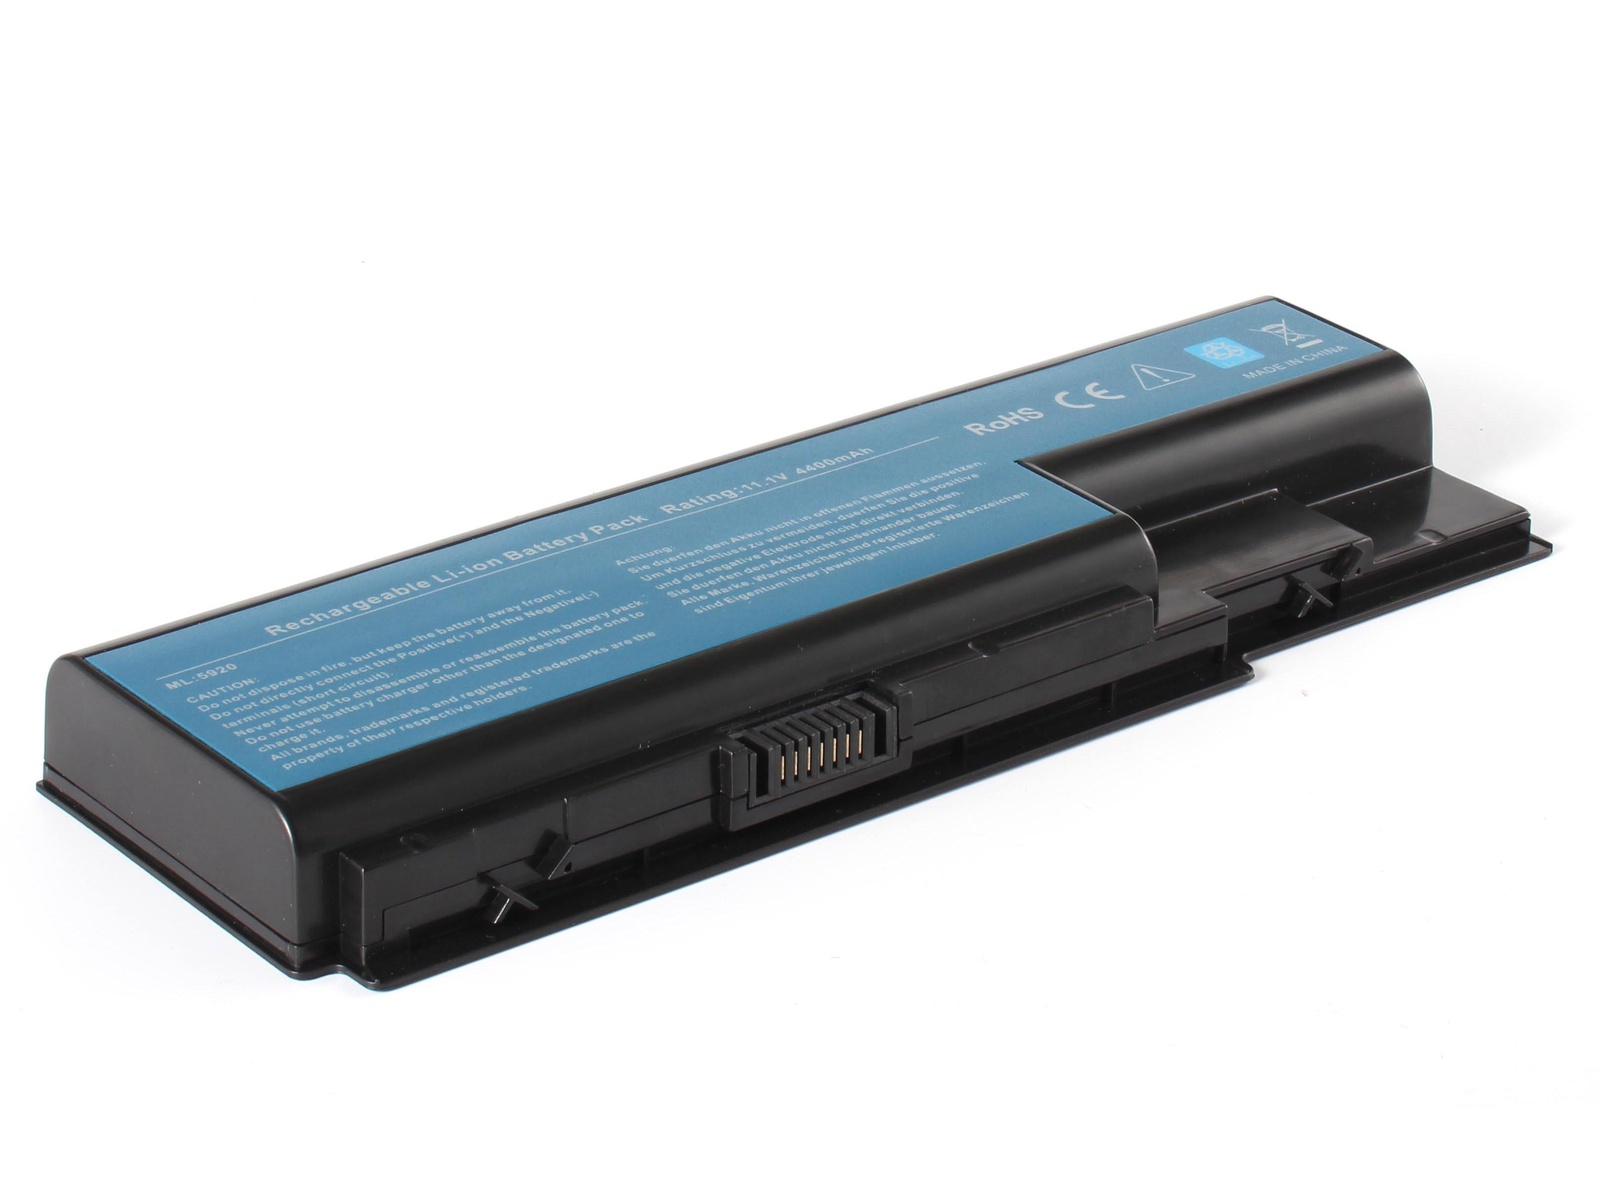 Аккумулятор для ноутбука AnyBatt для Acer Aspire 7736G-664G25Mi, Aspire 7738G-664G32Mi, Aspire 5910, Aspire 5315-1A2G12Mi, Aspire 5520G-402G16MI, Aspire 5520G-502G25Mi, Aspire 5920G-5A1G16Mi, Aspire 5942G-434G50Mi gt 240m gt240m n10p gs a2 1gb ddr3 mxm ii vga card video card for asus m90gn acer aspire 5520g 5920g